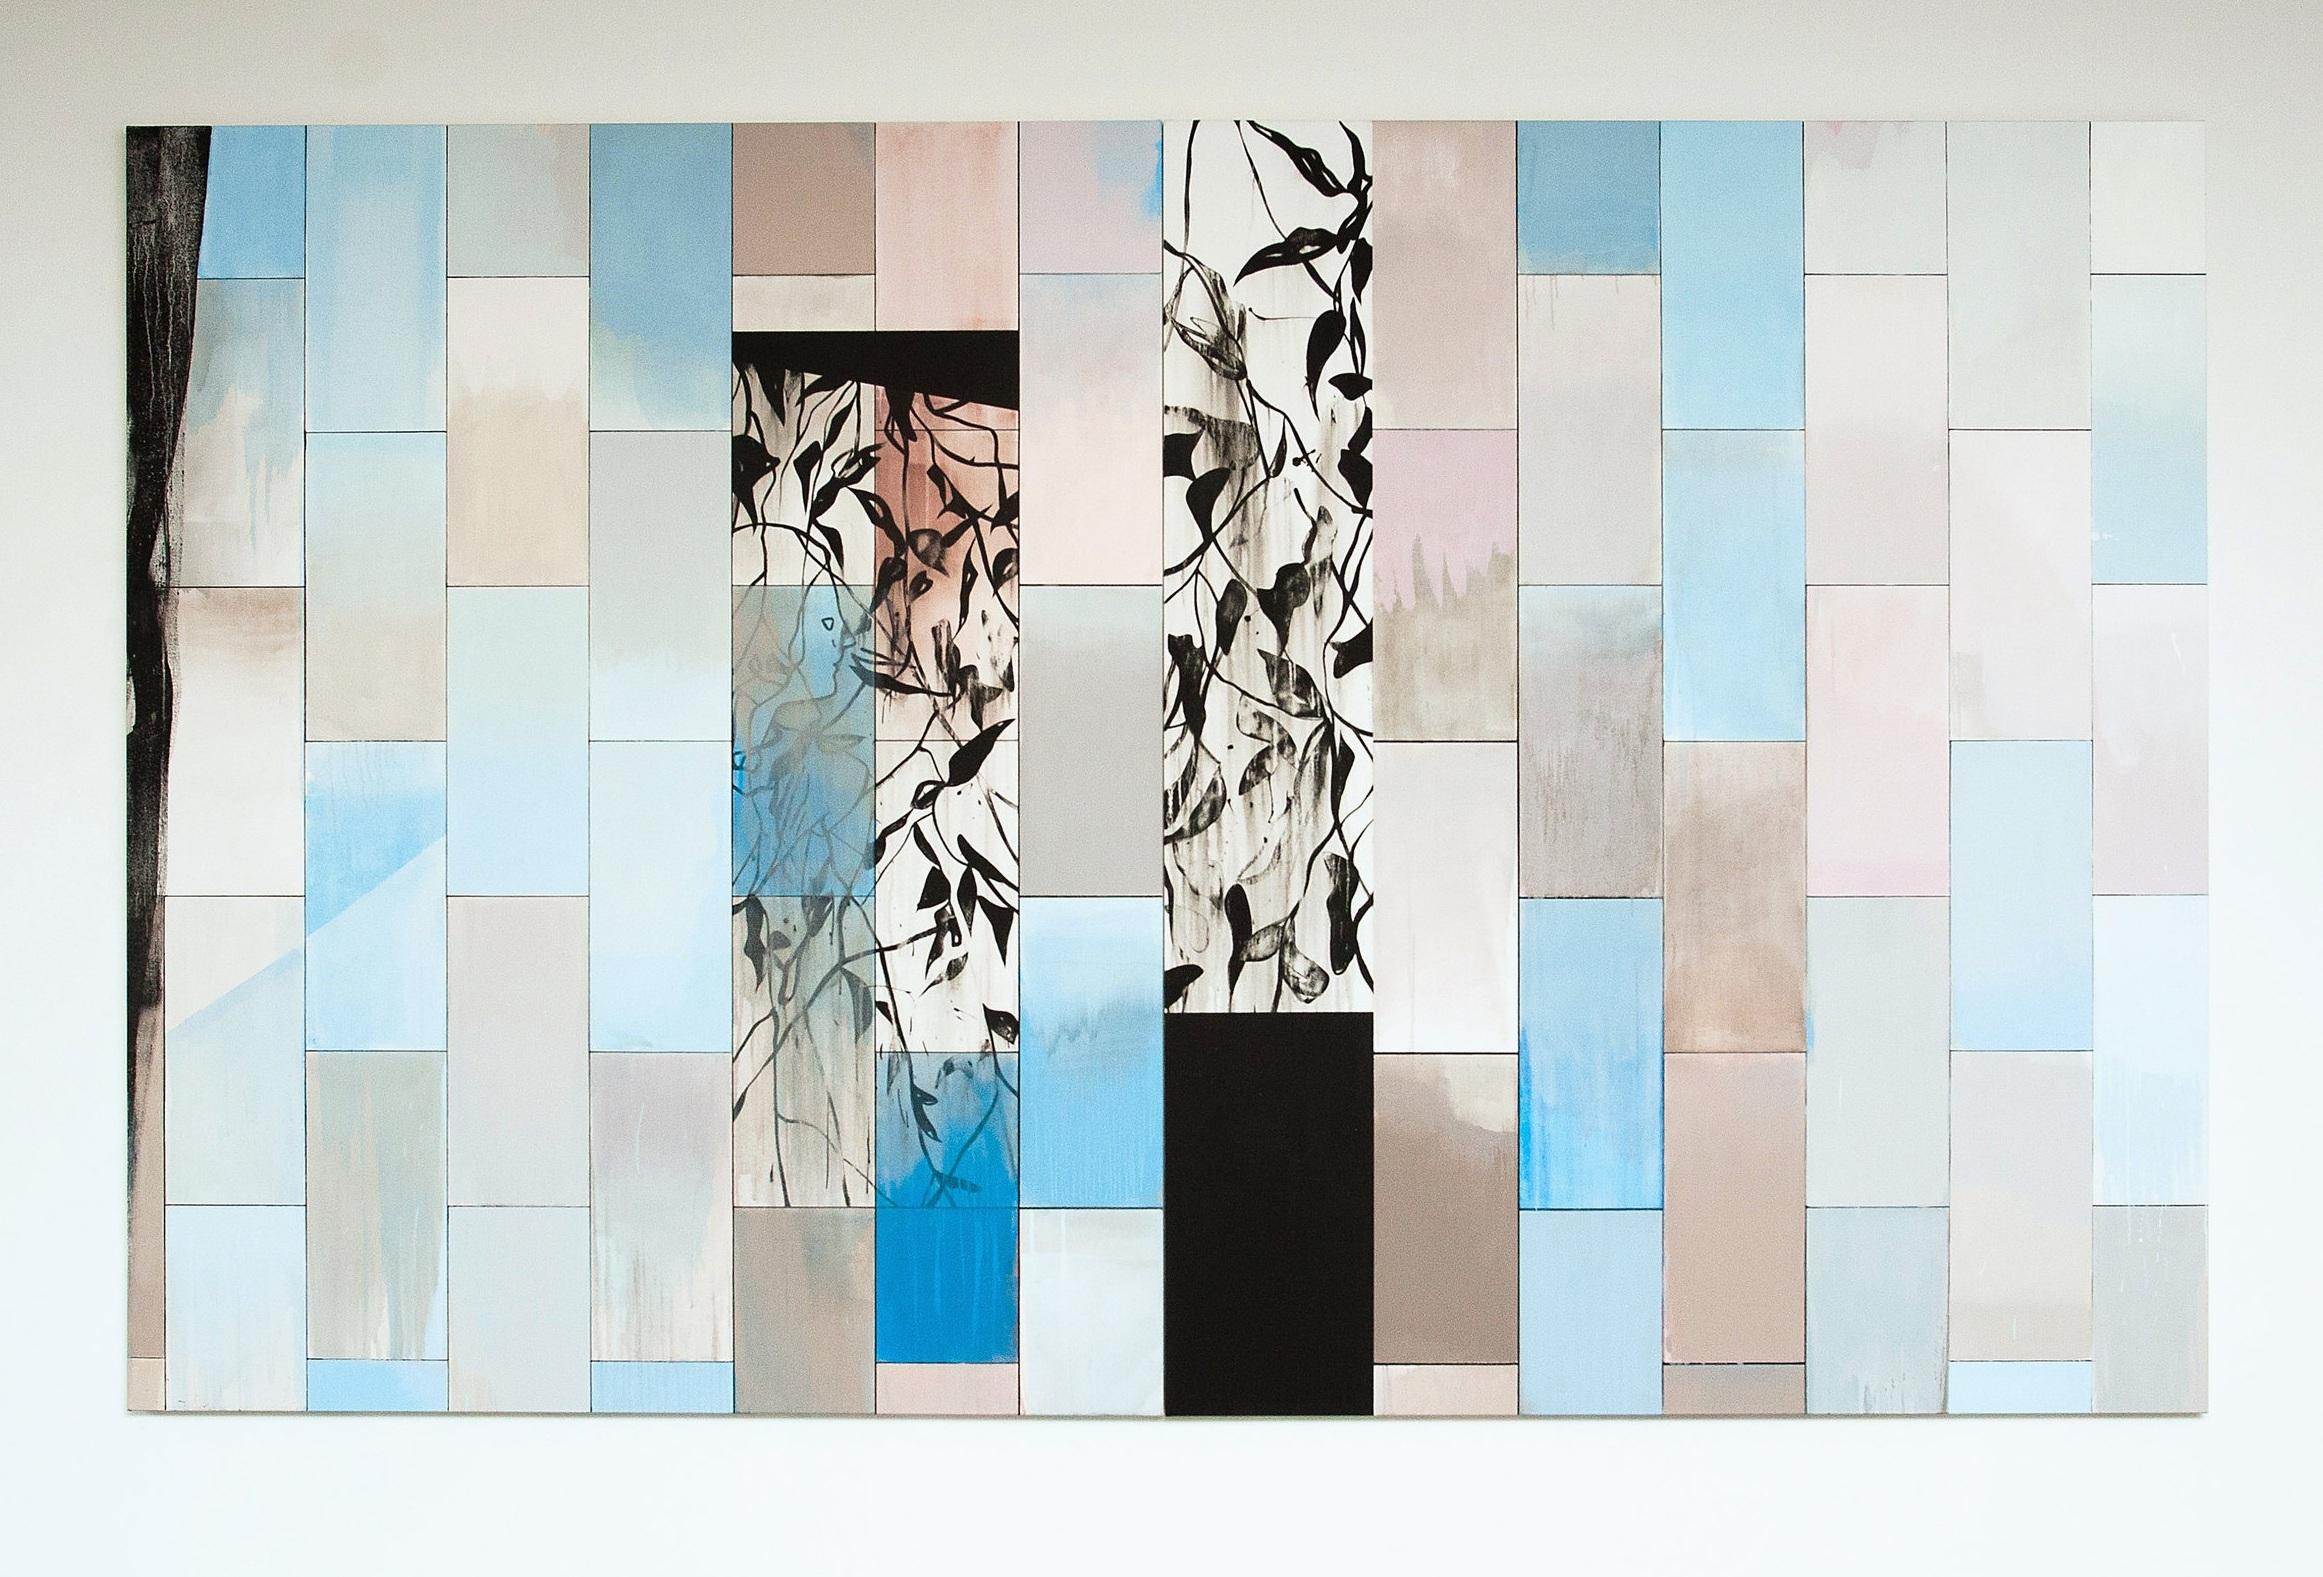 Wall of windows (interlude)